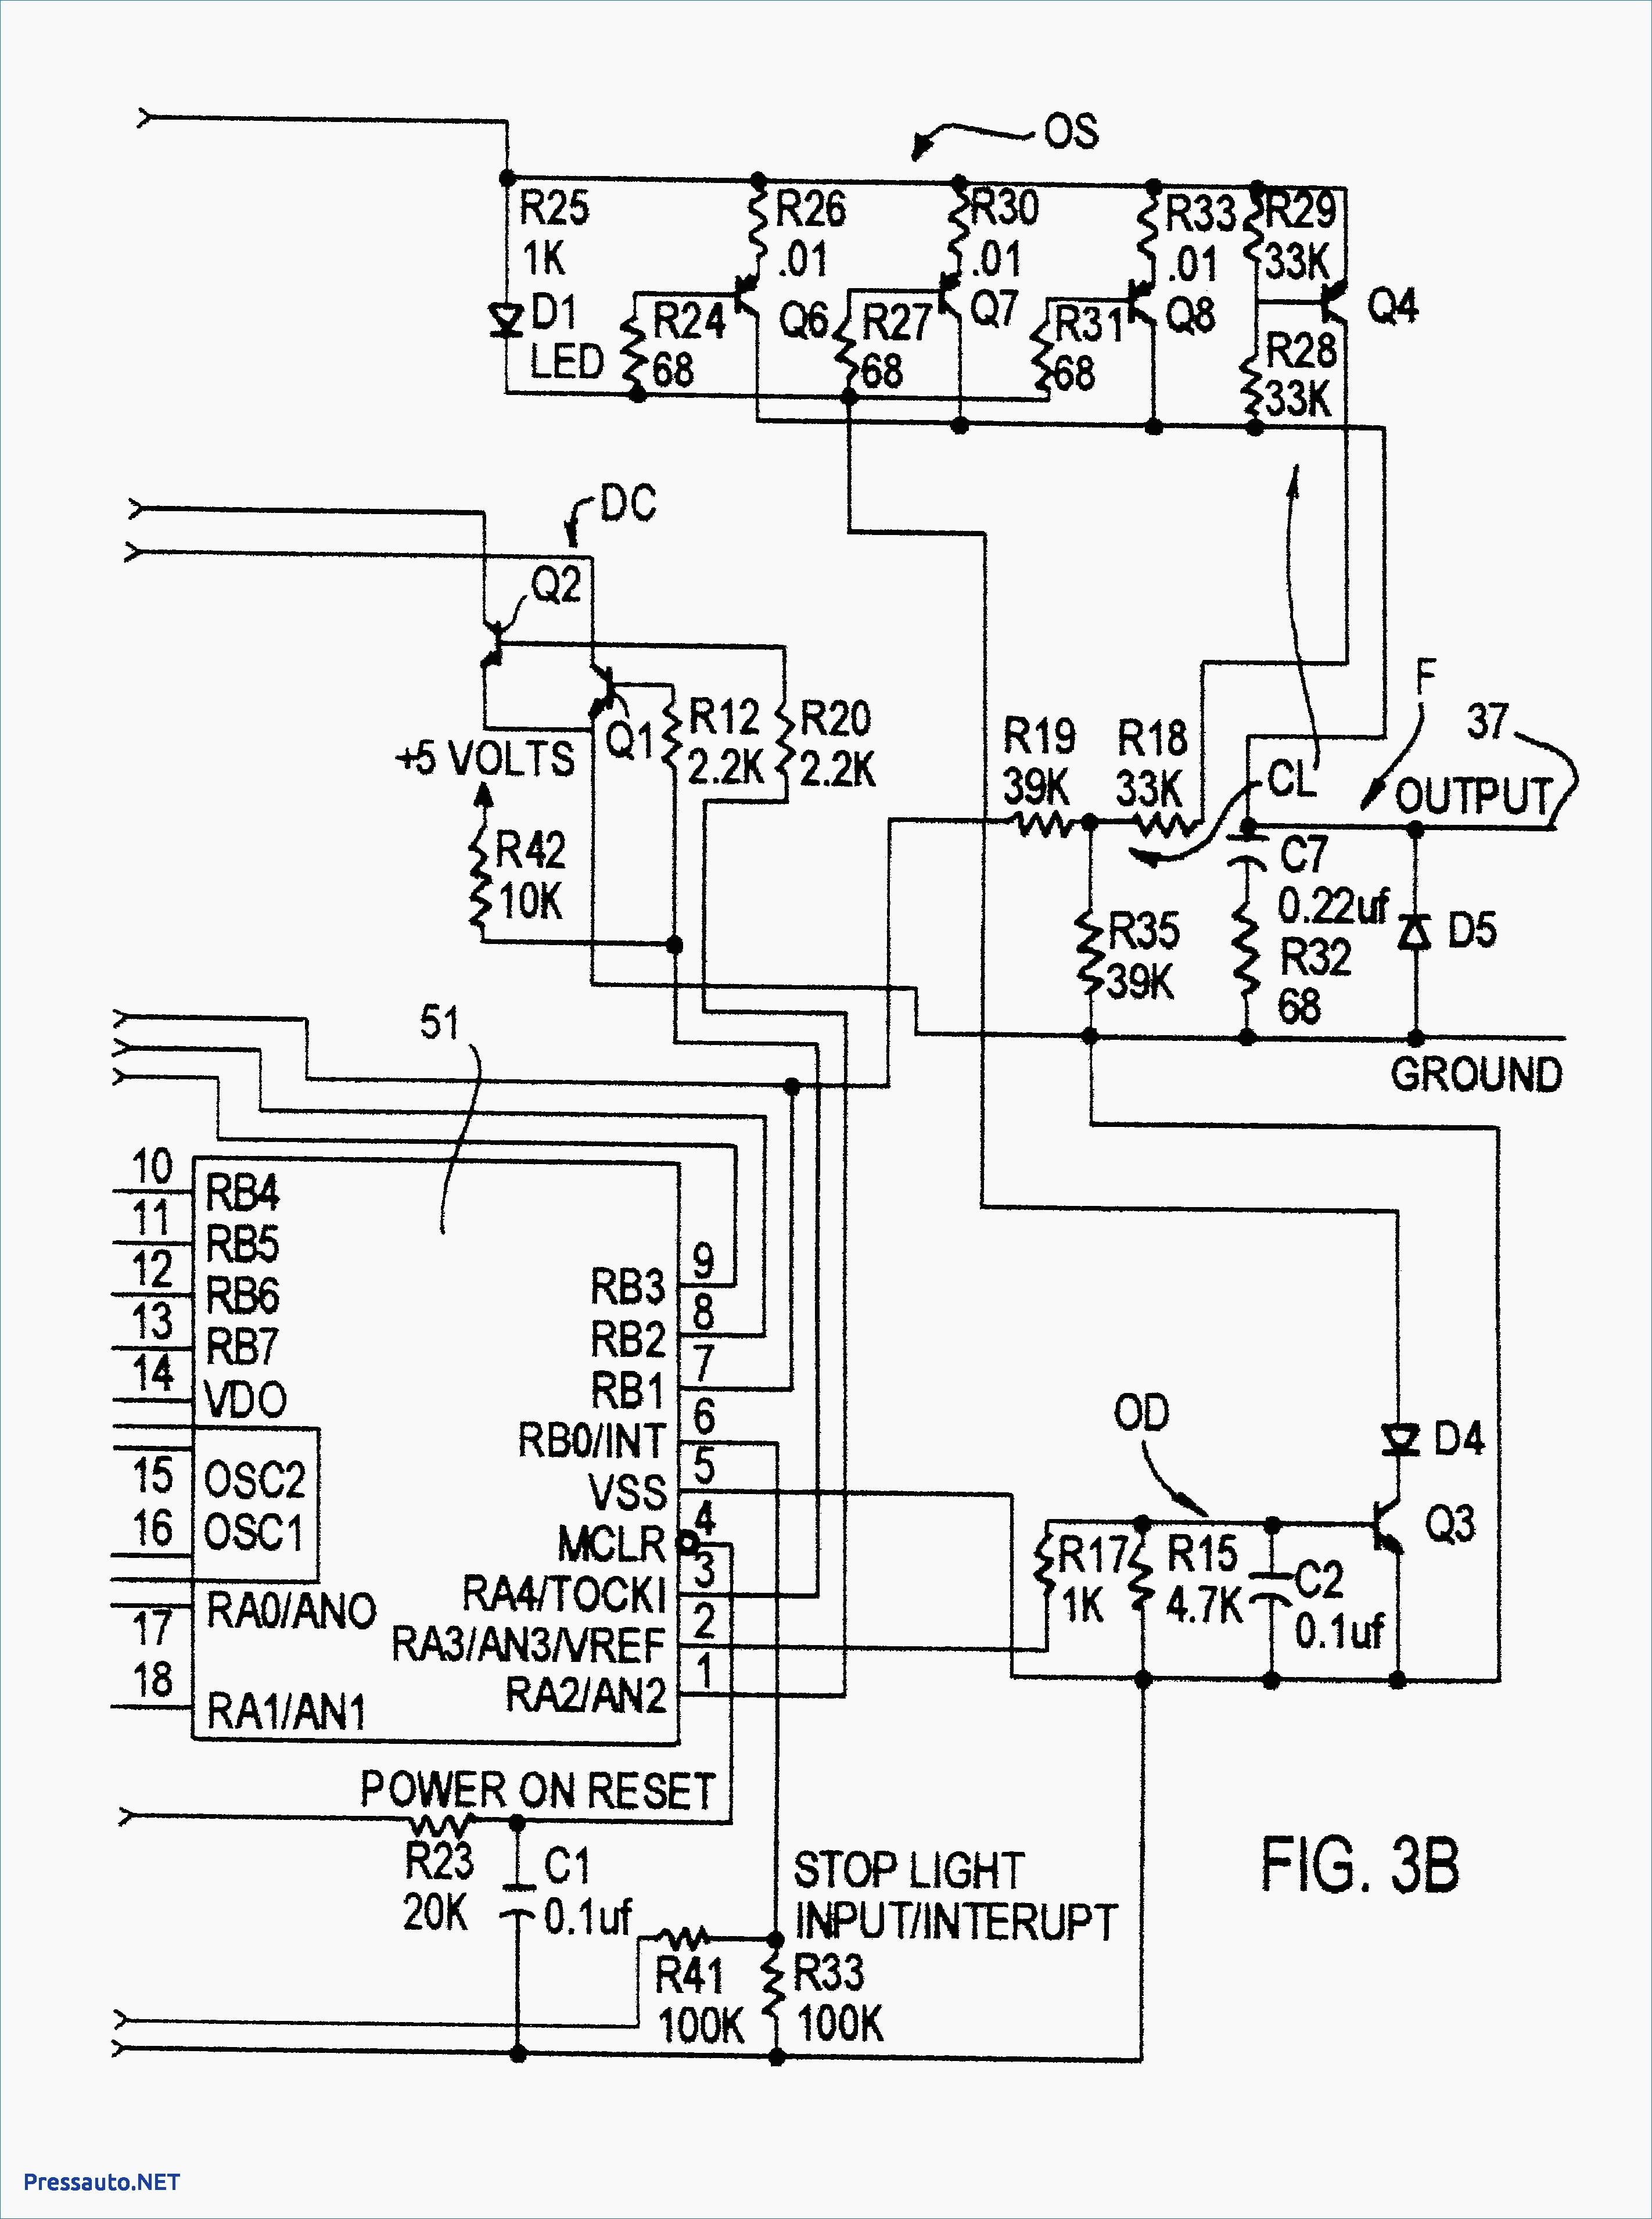 2004 Toyota Sequoia Wiring Harness Diagram Master Blogs Brake Tacoma Rear Imageresizertool Com Tundra Stereo